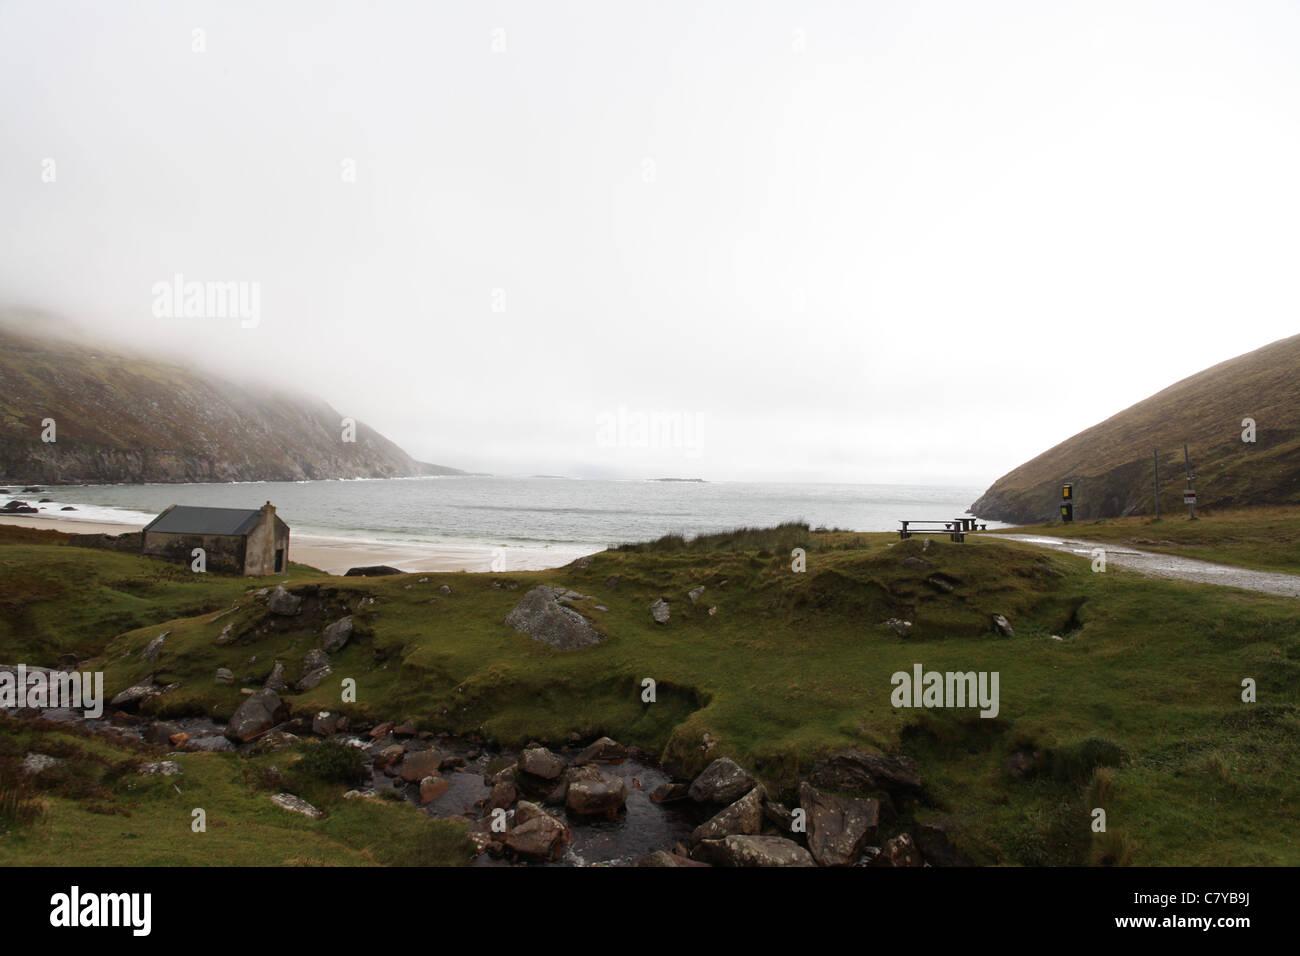 Keem Bay on Achill Island - Stock Image